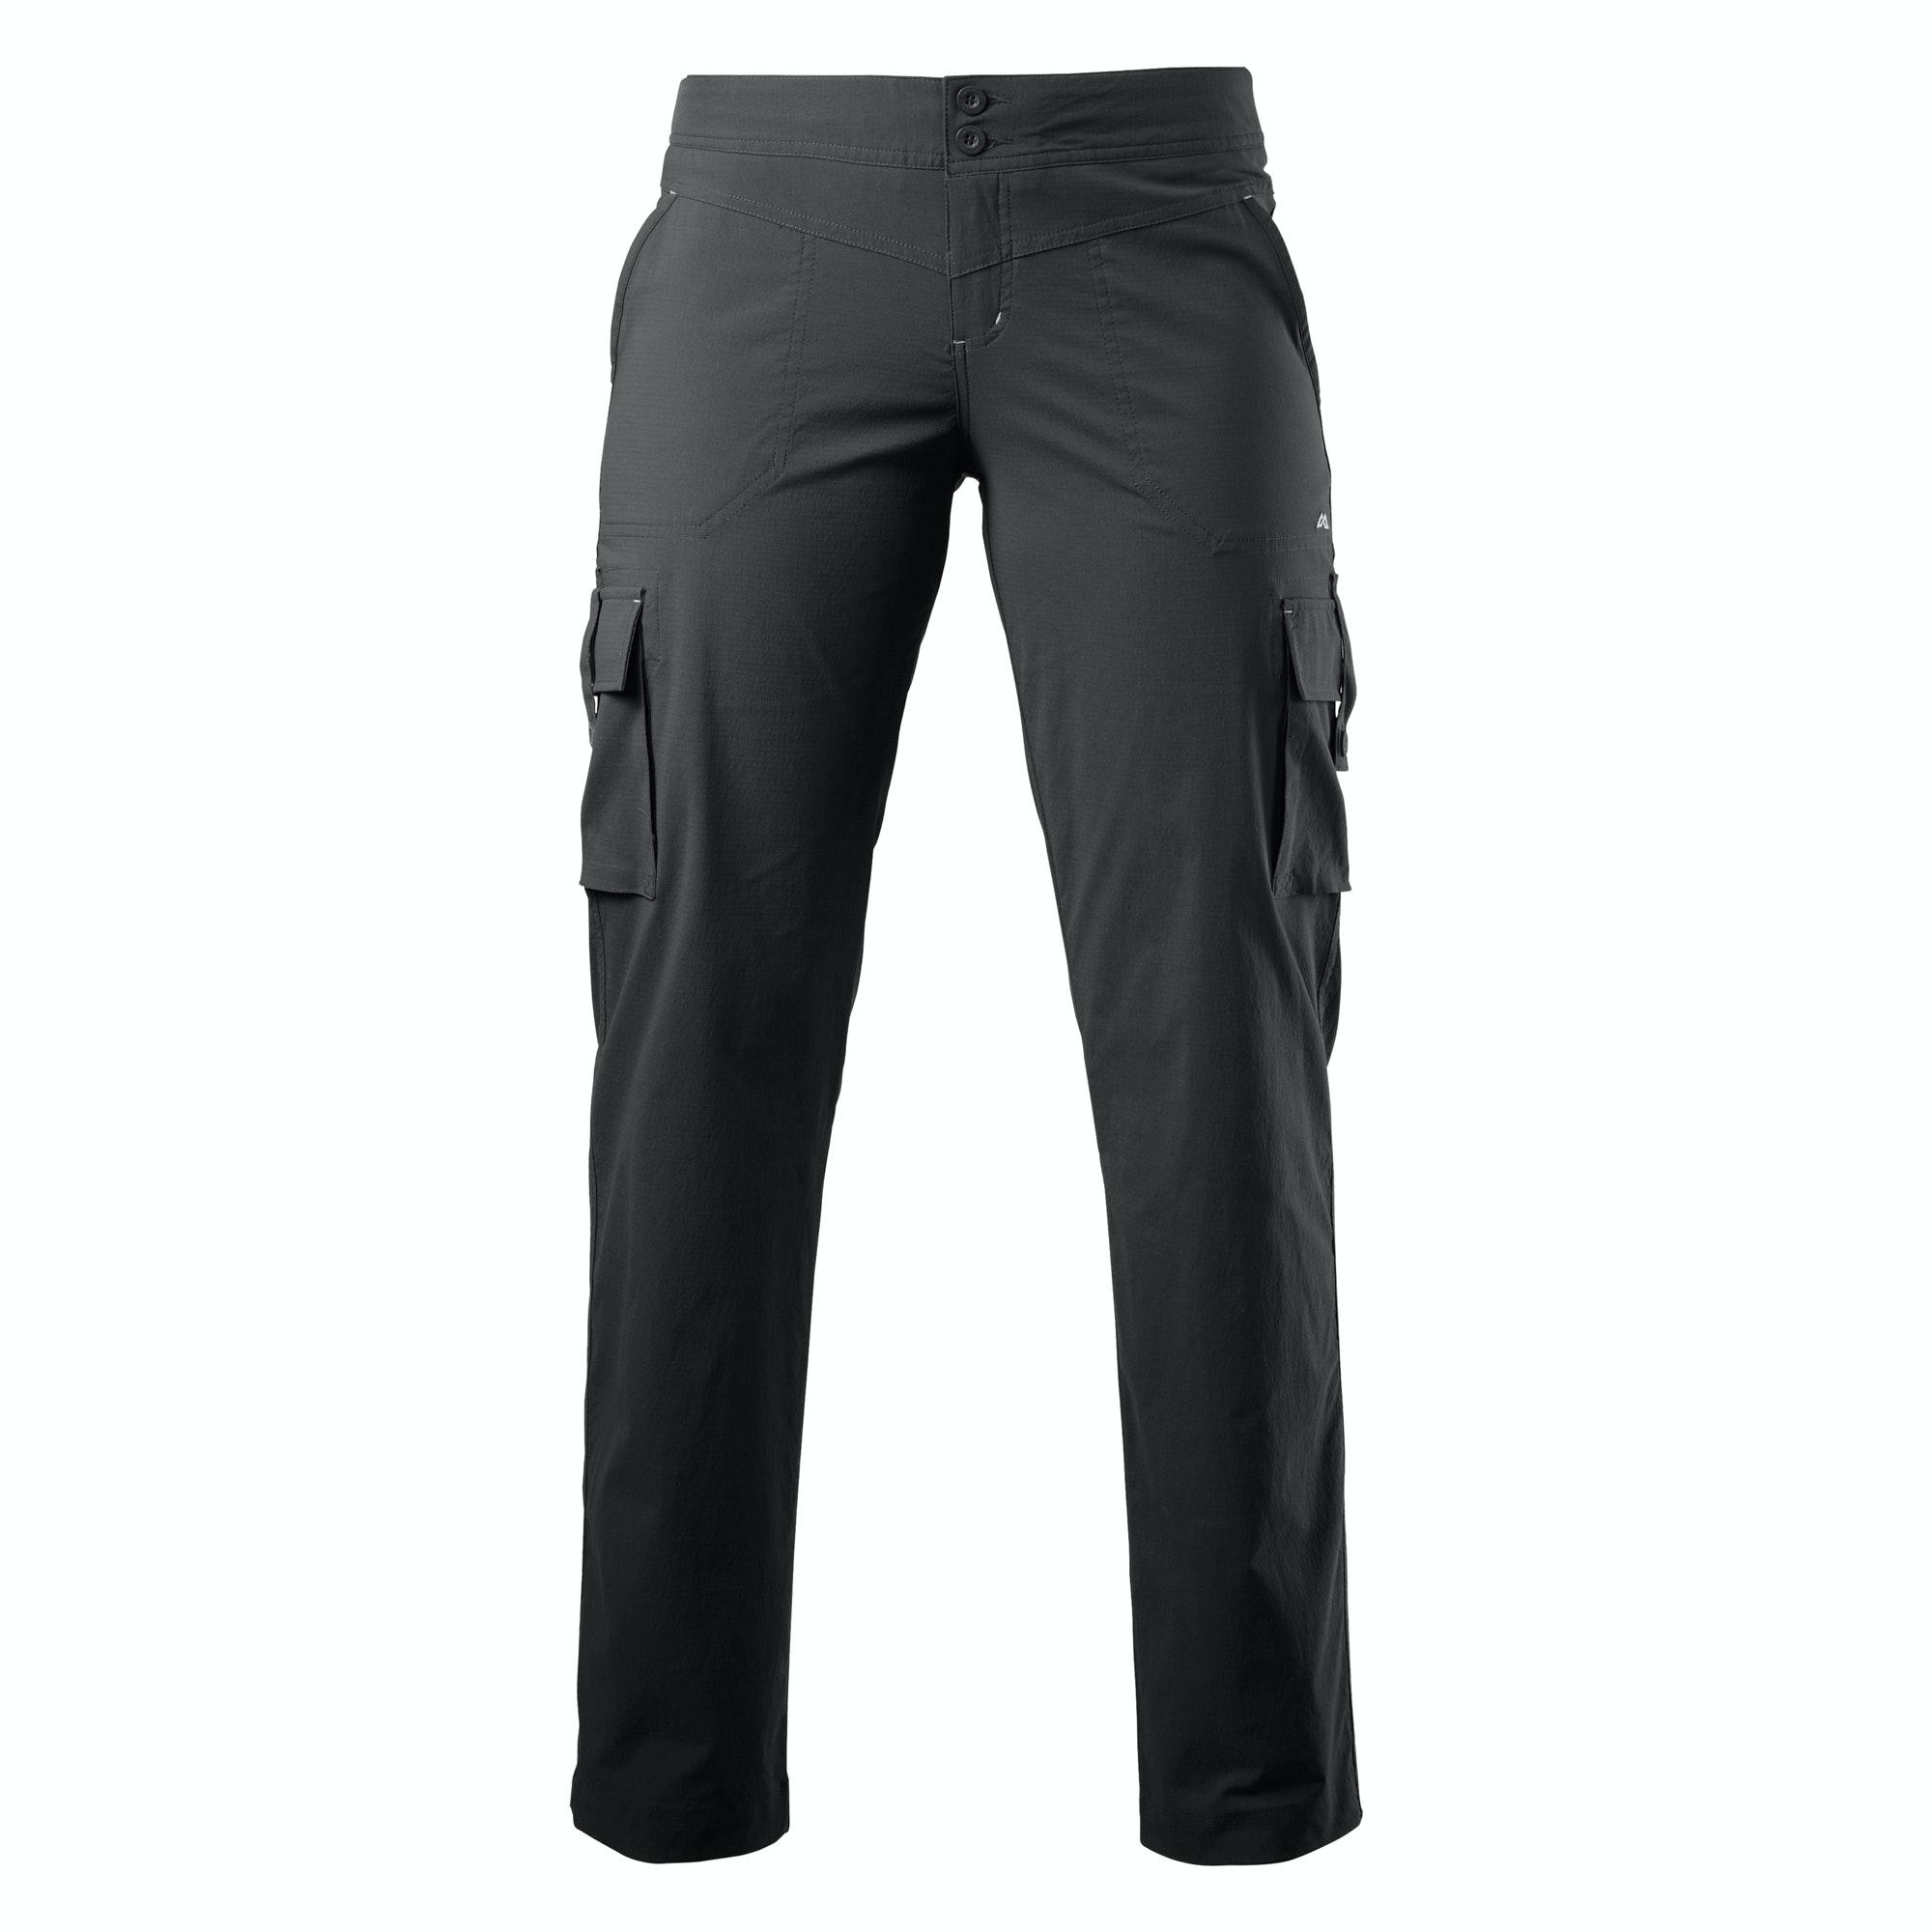 NEW Kathmandu Miro Women s quickDRY Pants Trousers Stretch Travel ... 5b5cb49f6